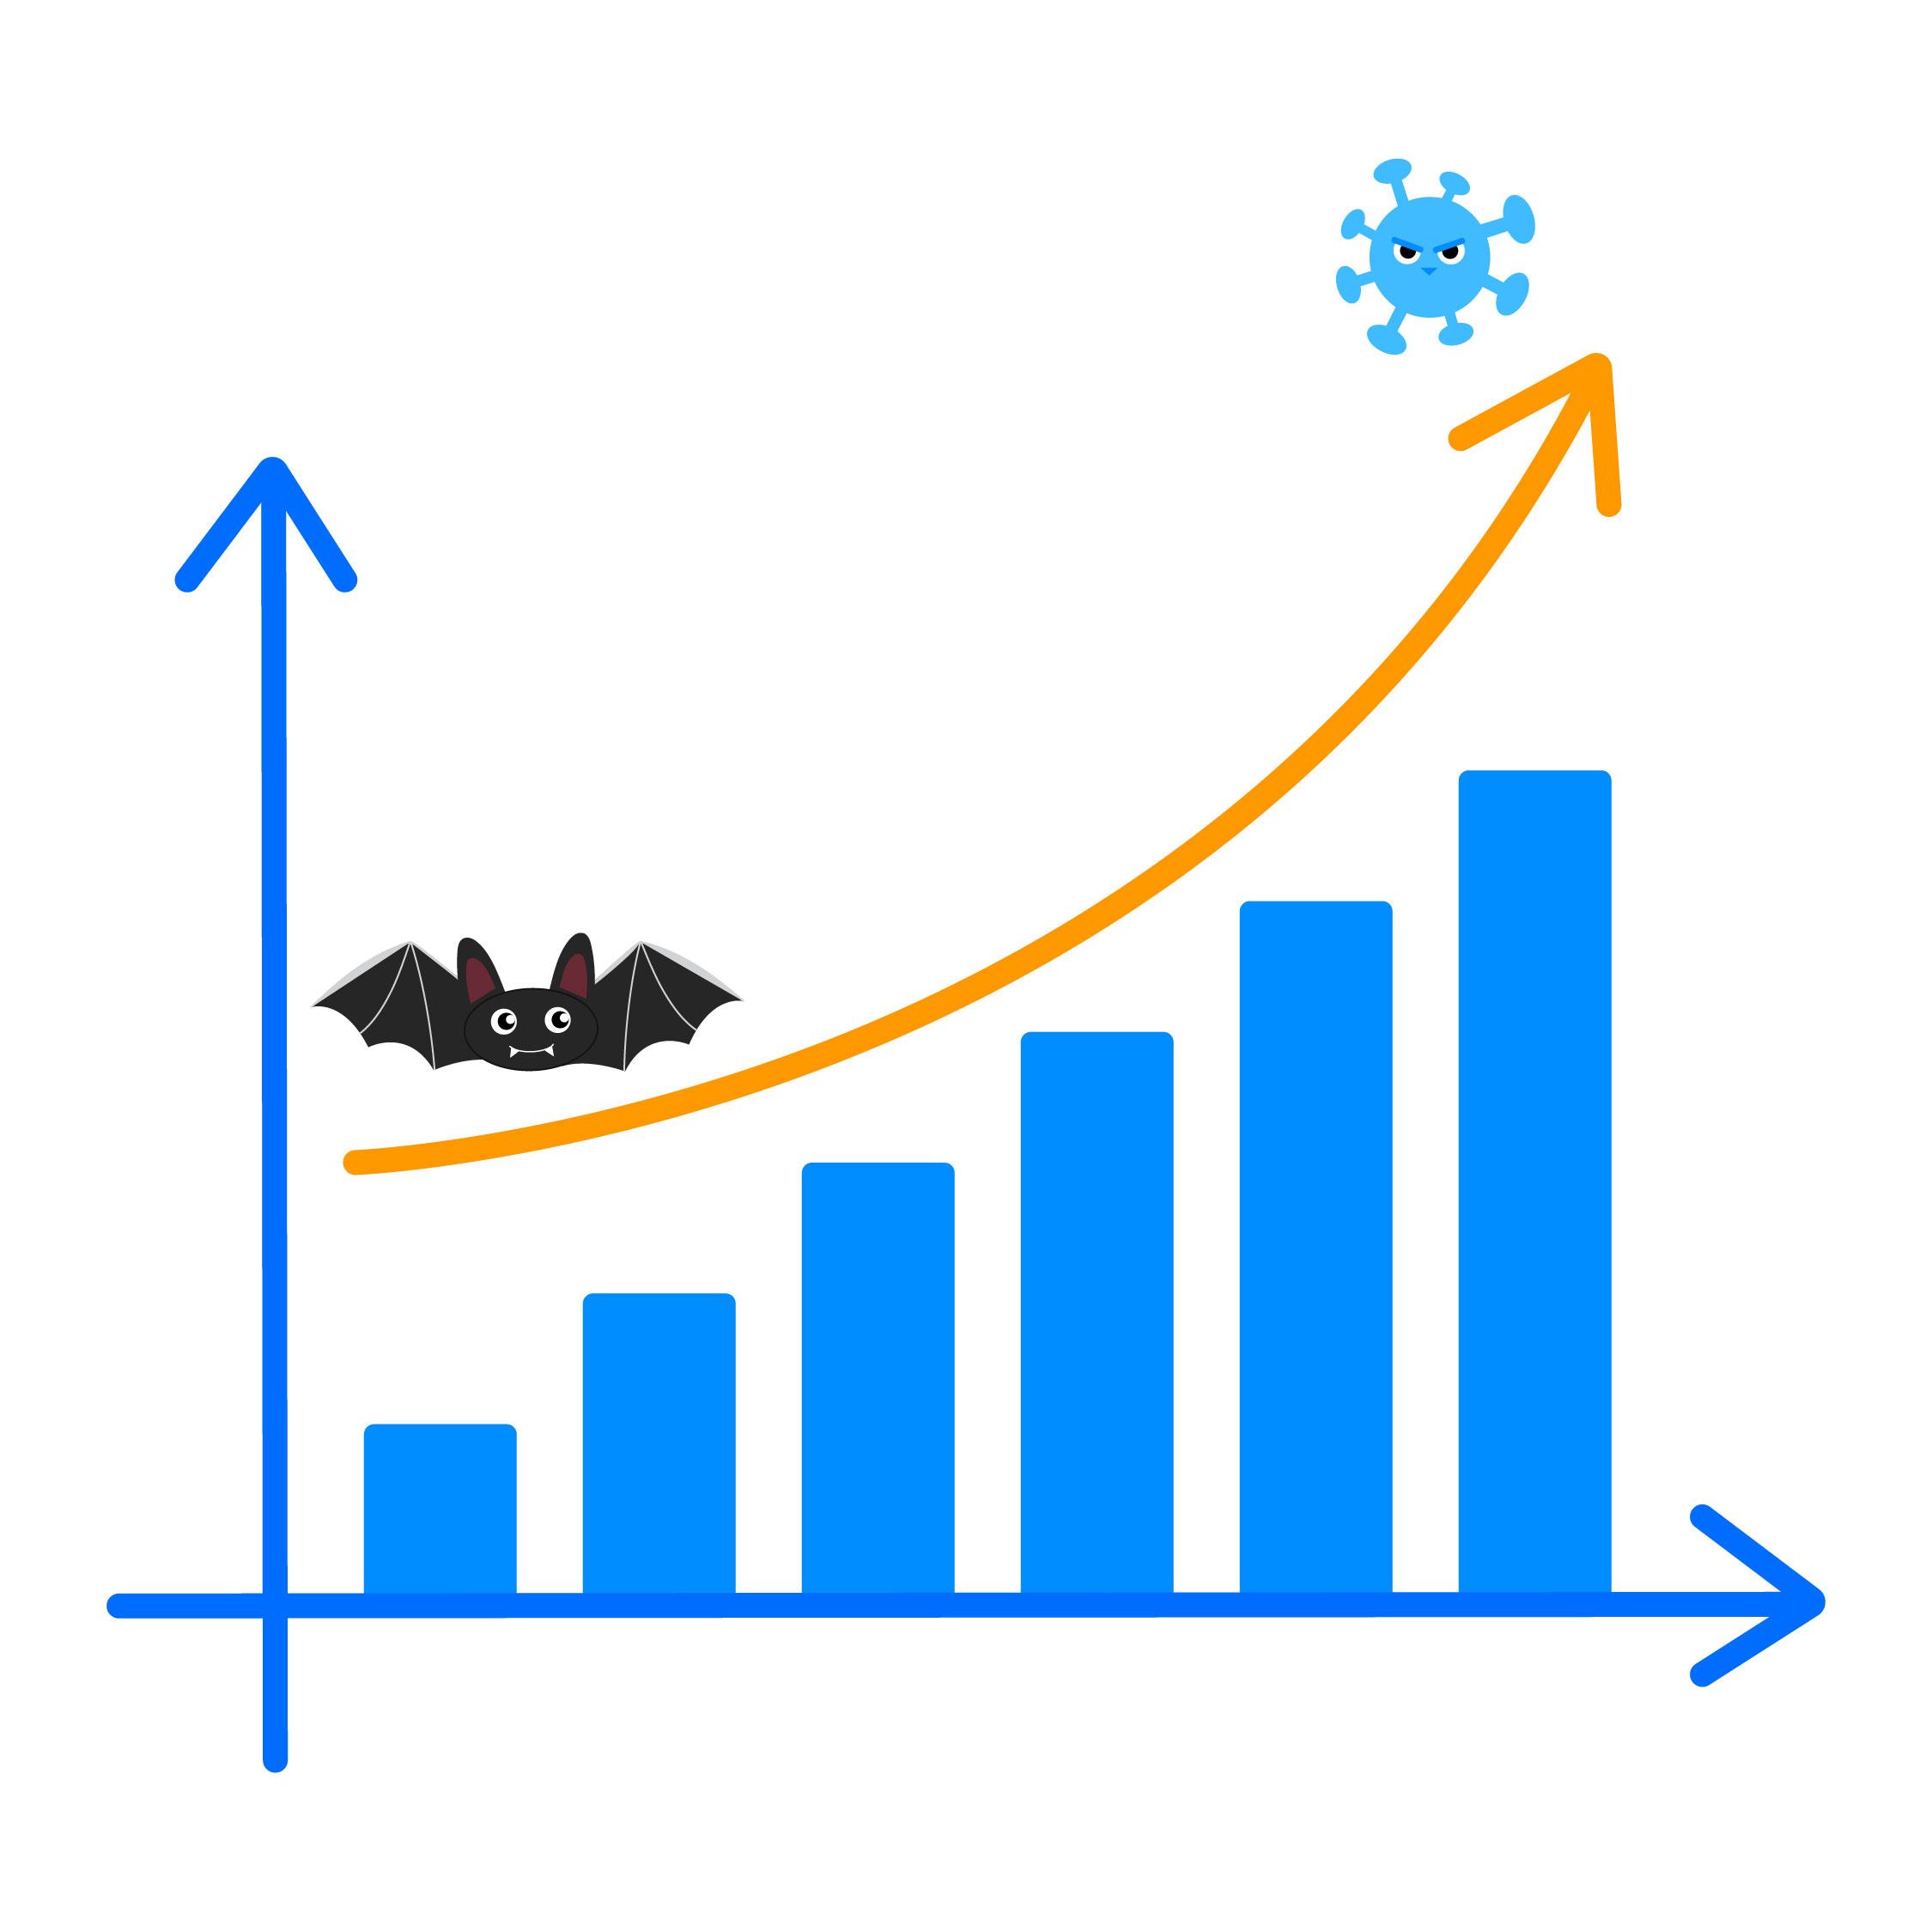 A cartoon graph